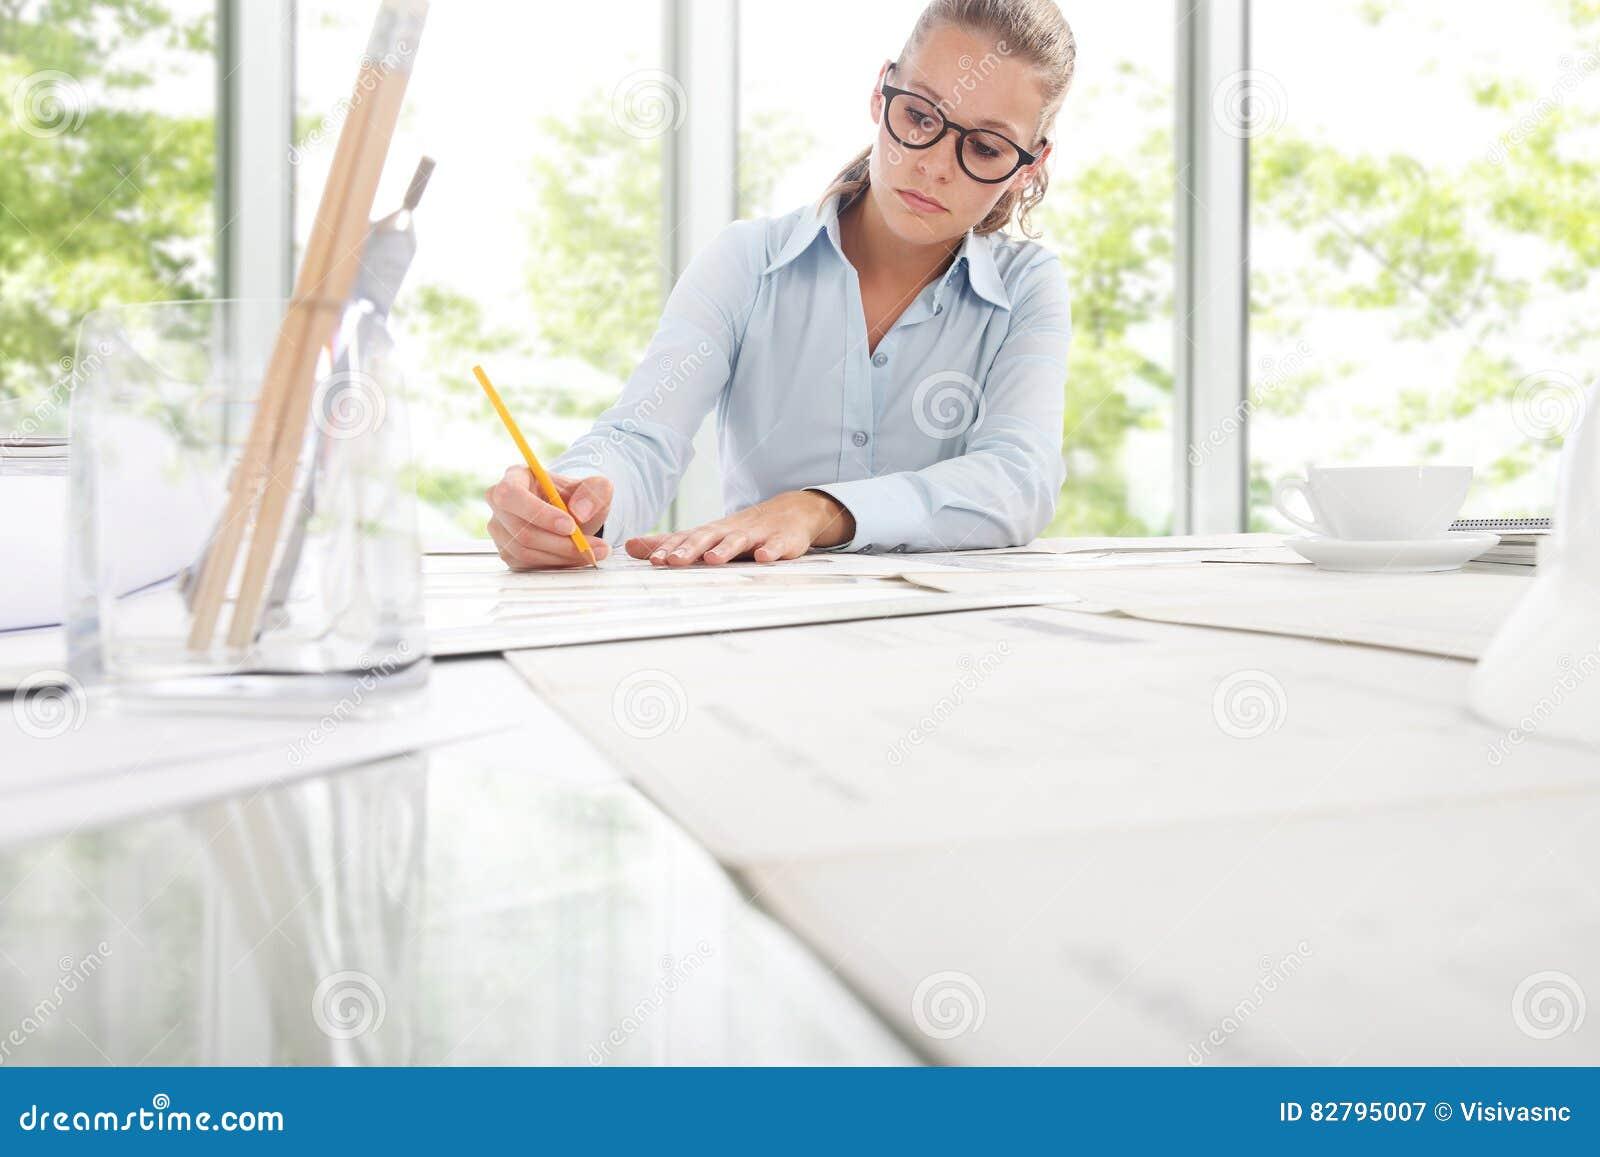 Ingegnere design working dell 39 architetto in ufficio for Ufficio architetto design